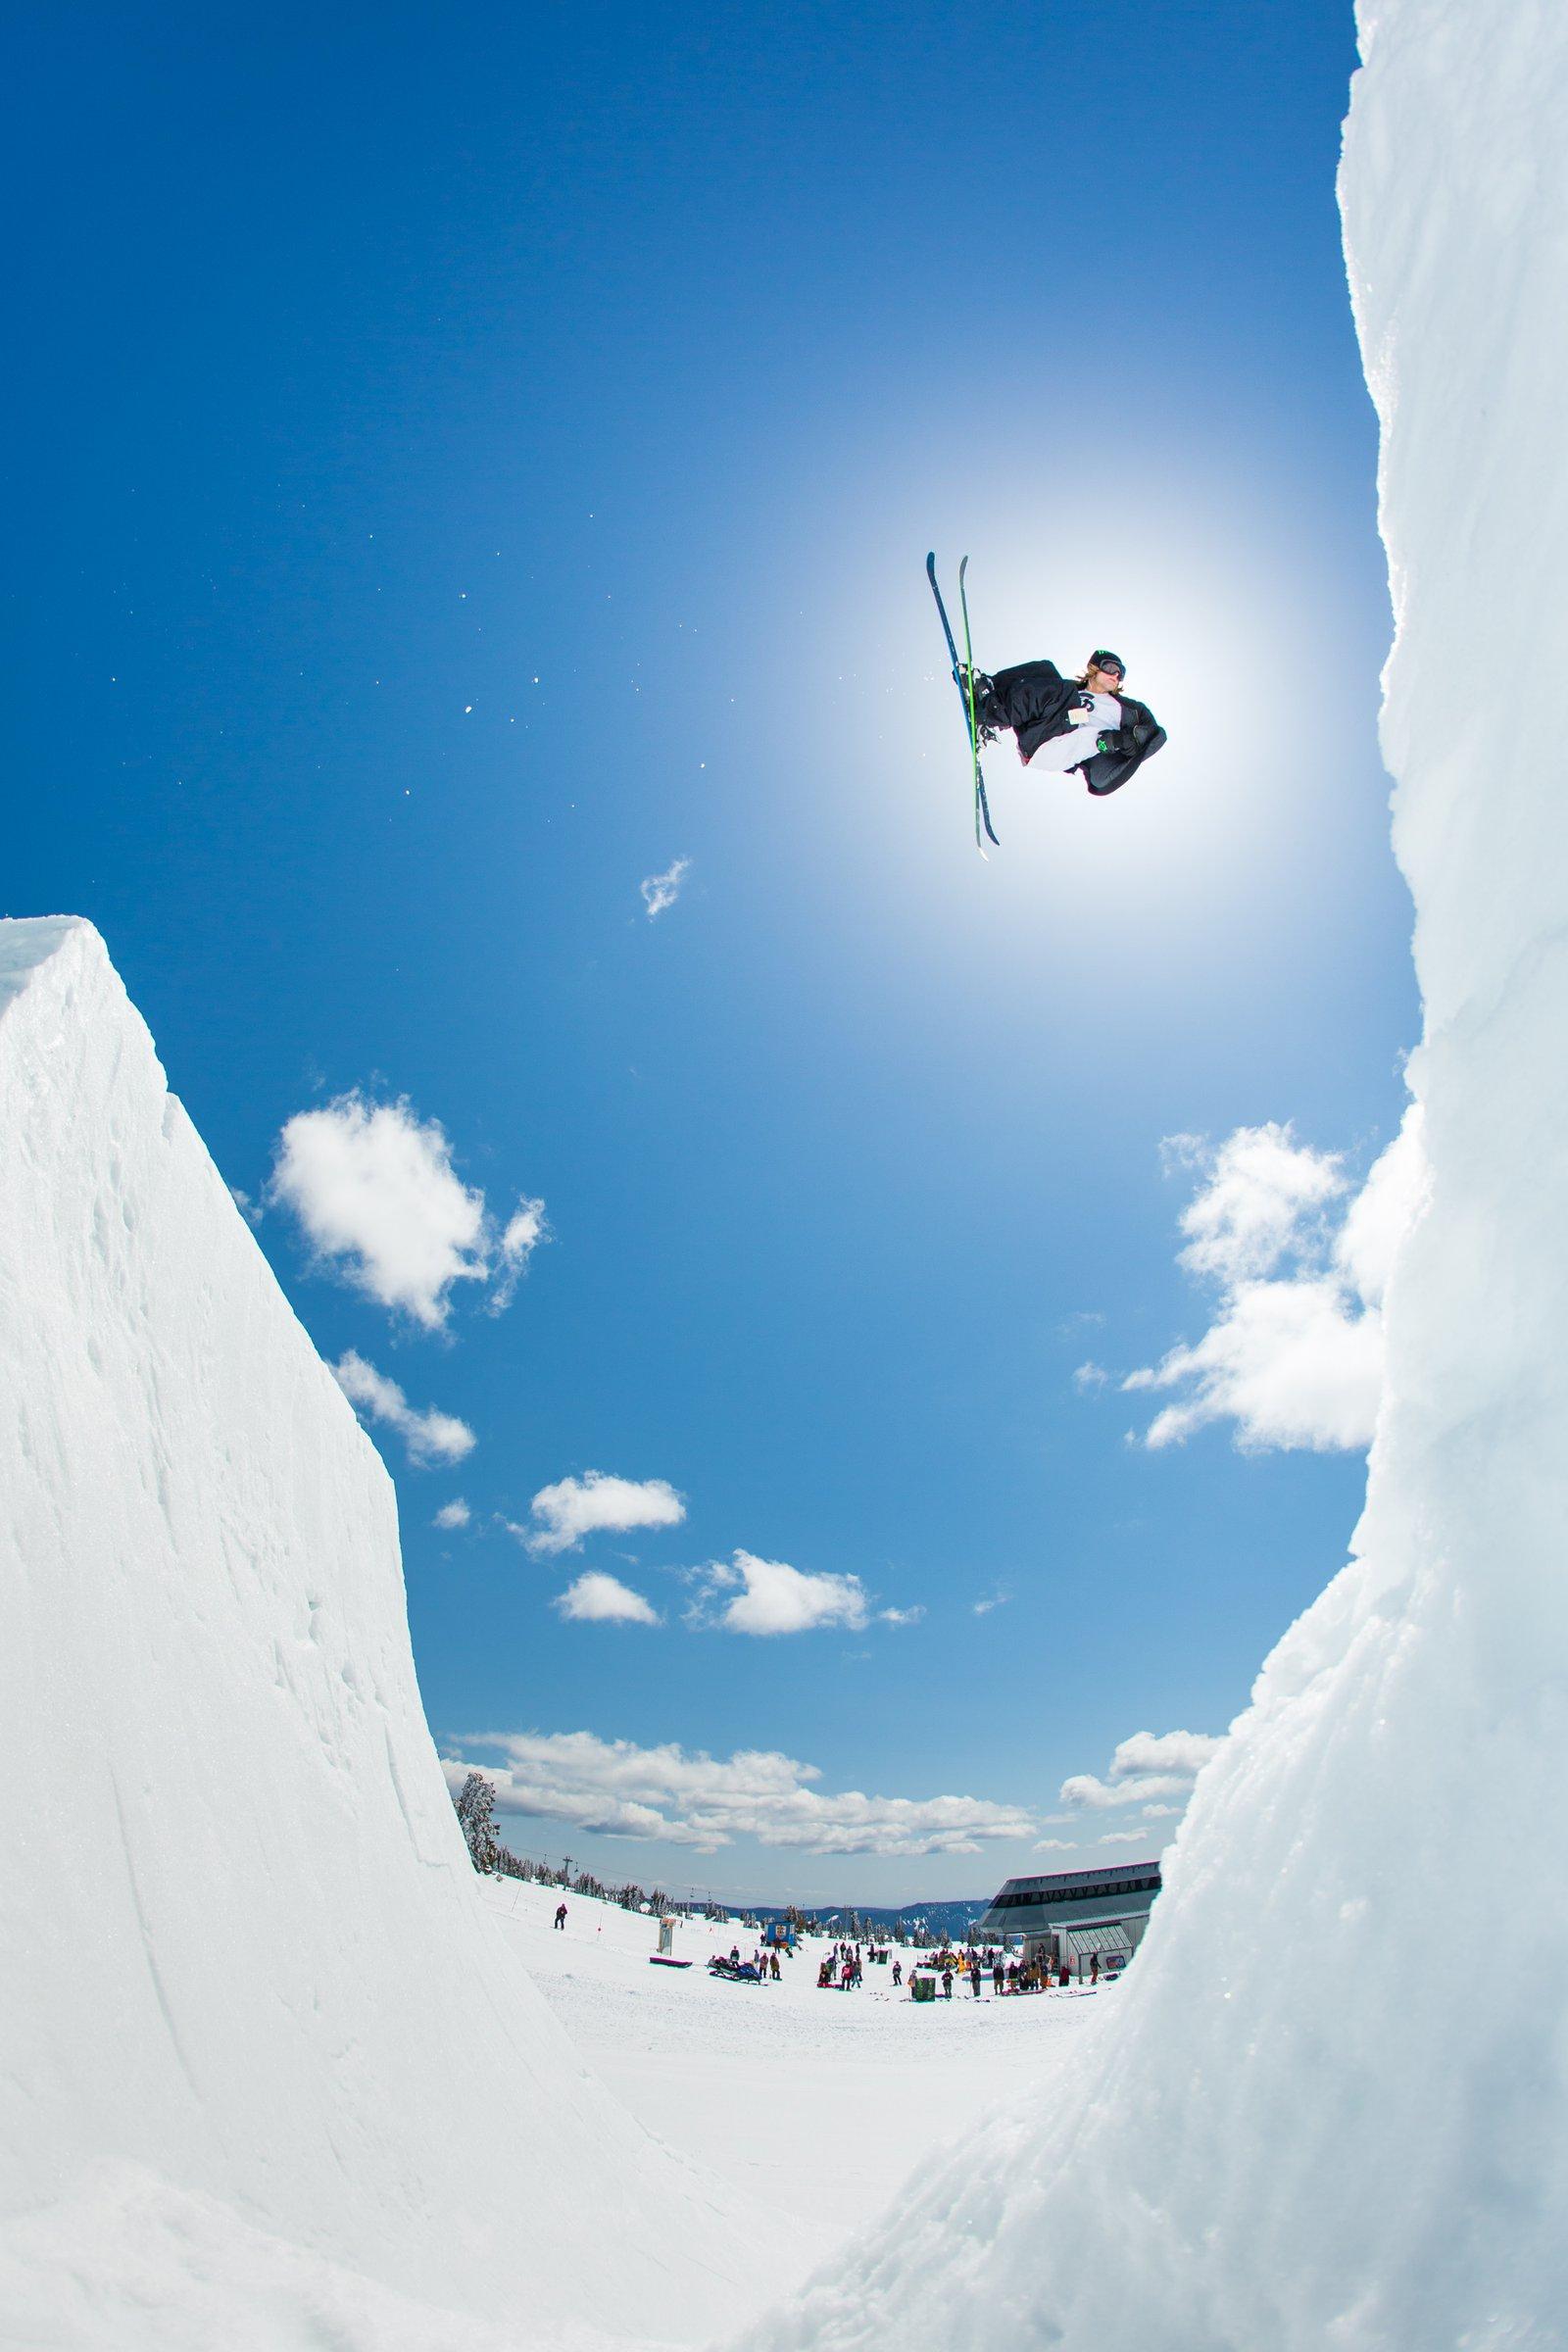 #WCS8 Best Jump Action Photo - Noah Albaladejo